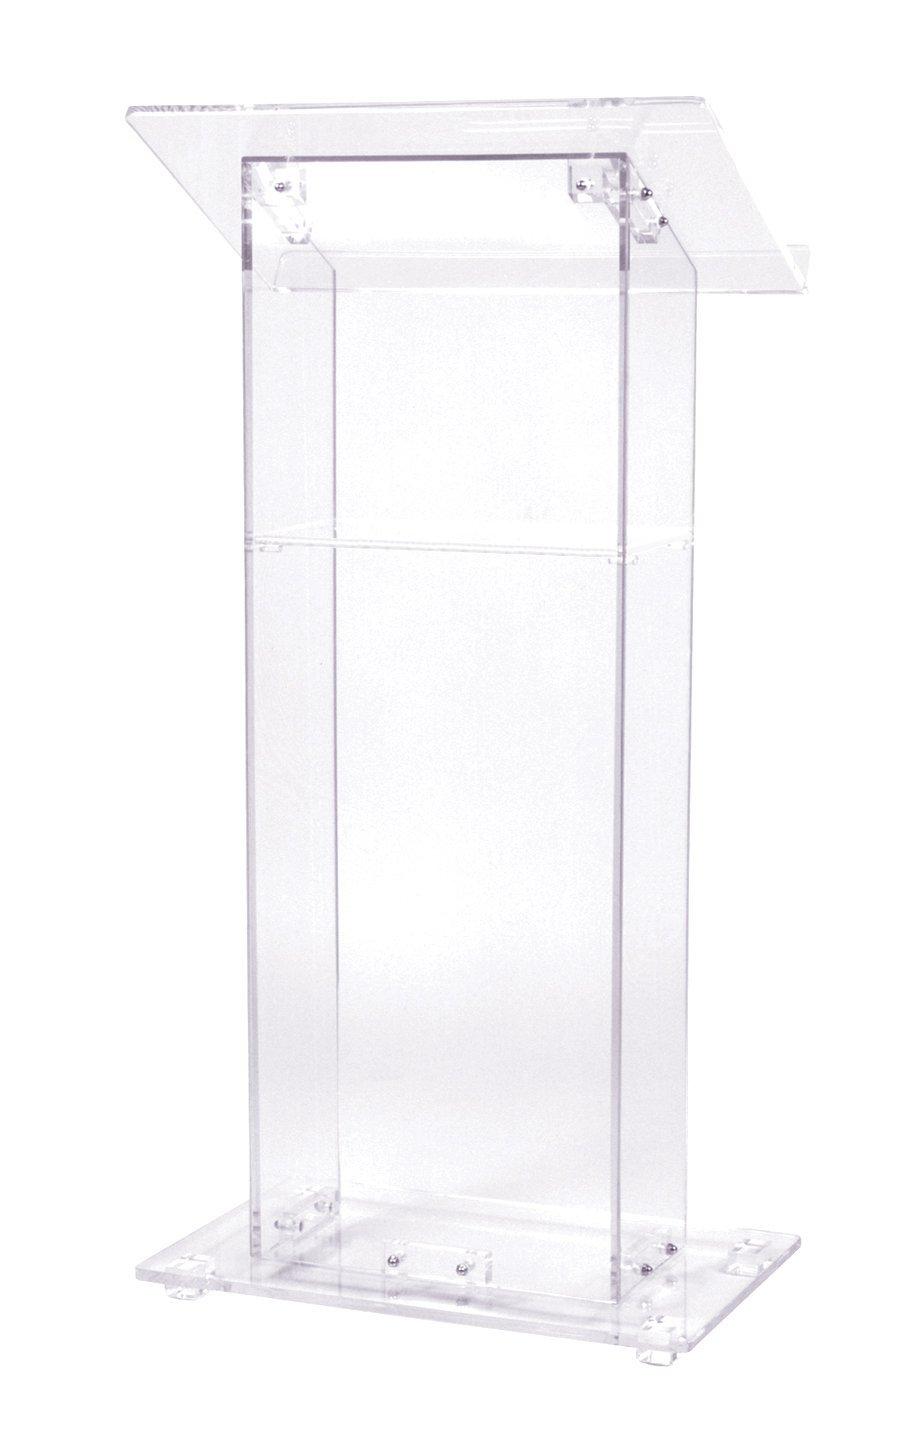 Acrylic Lectern With Shelf, Crystal Clear Decoration Table Podium Furniture Plexiglass